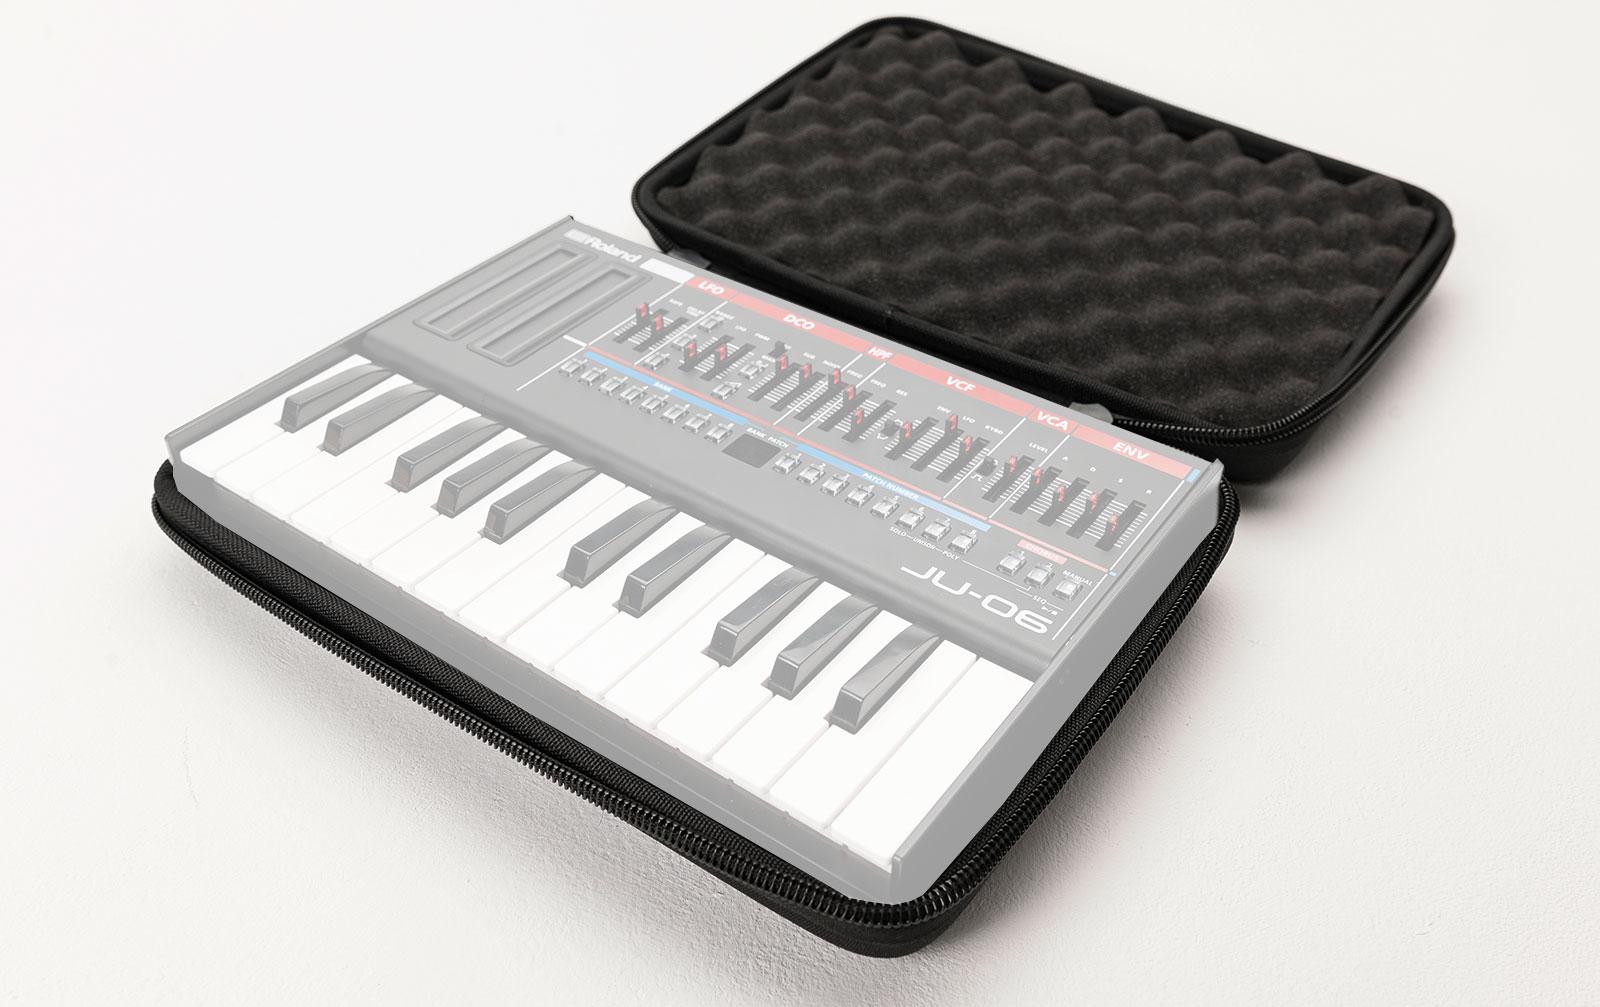 magma-ctrl-case-boutique-key-black-black